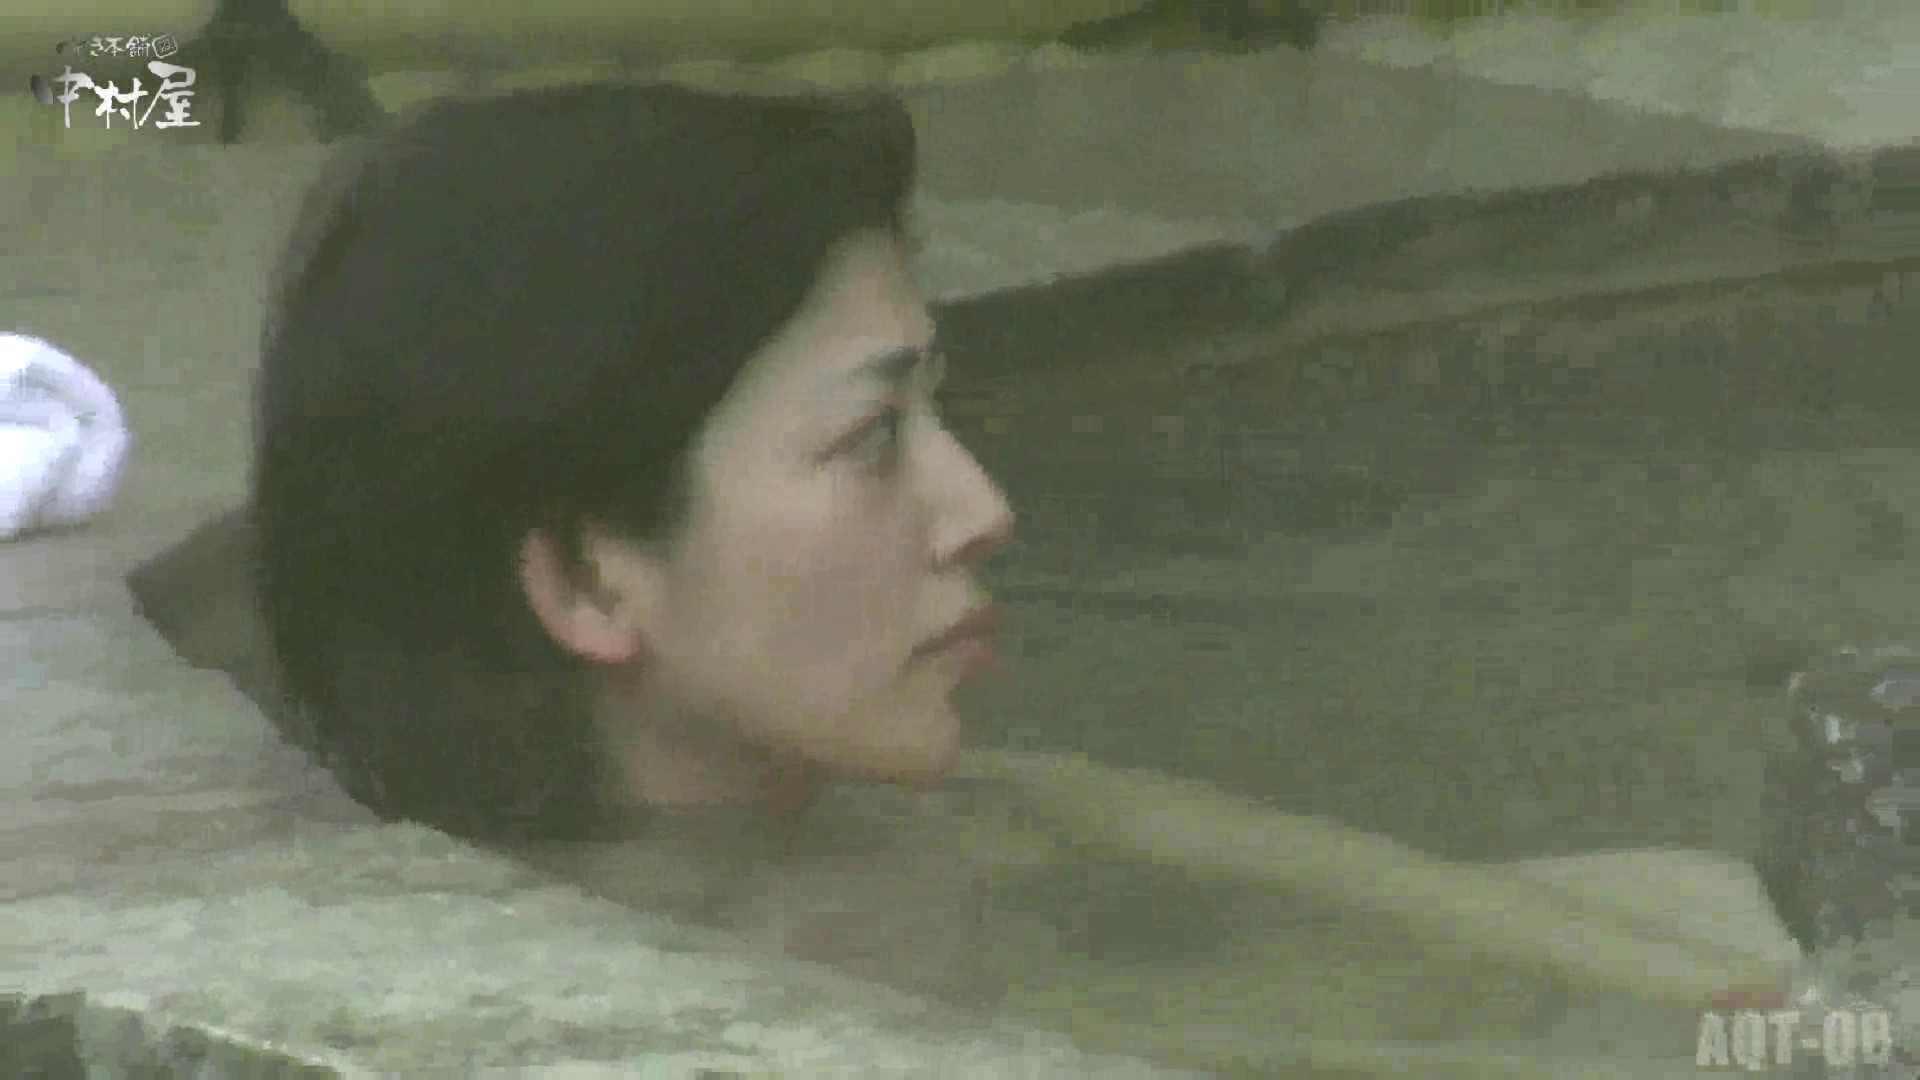 Aquaな露天風呂Vol.872潜入盗撮露天風呂八判湯 其の四 OL女体 | 女体盗撮  92連発 57